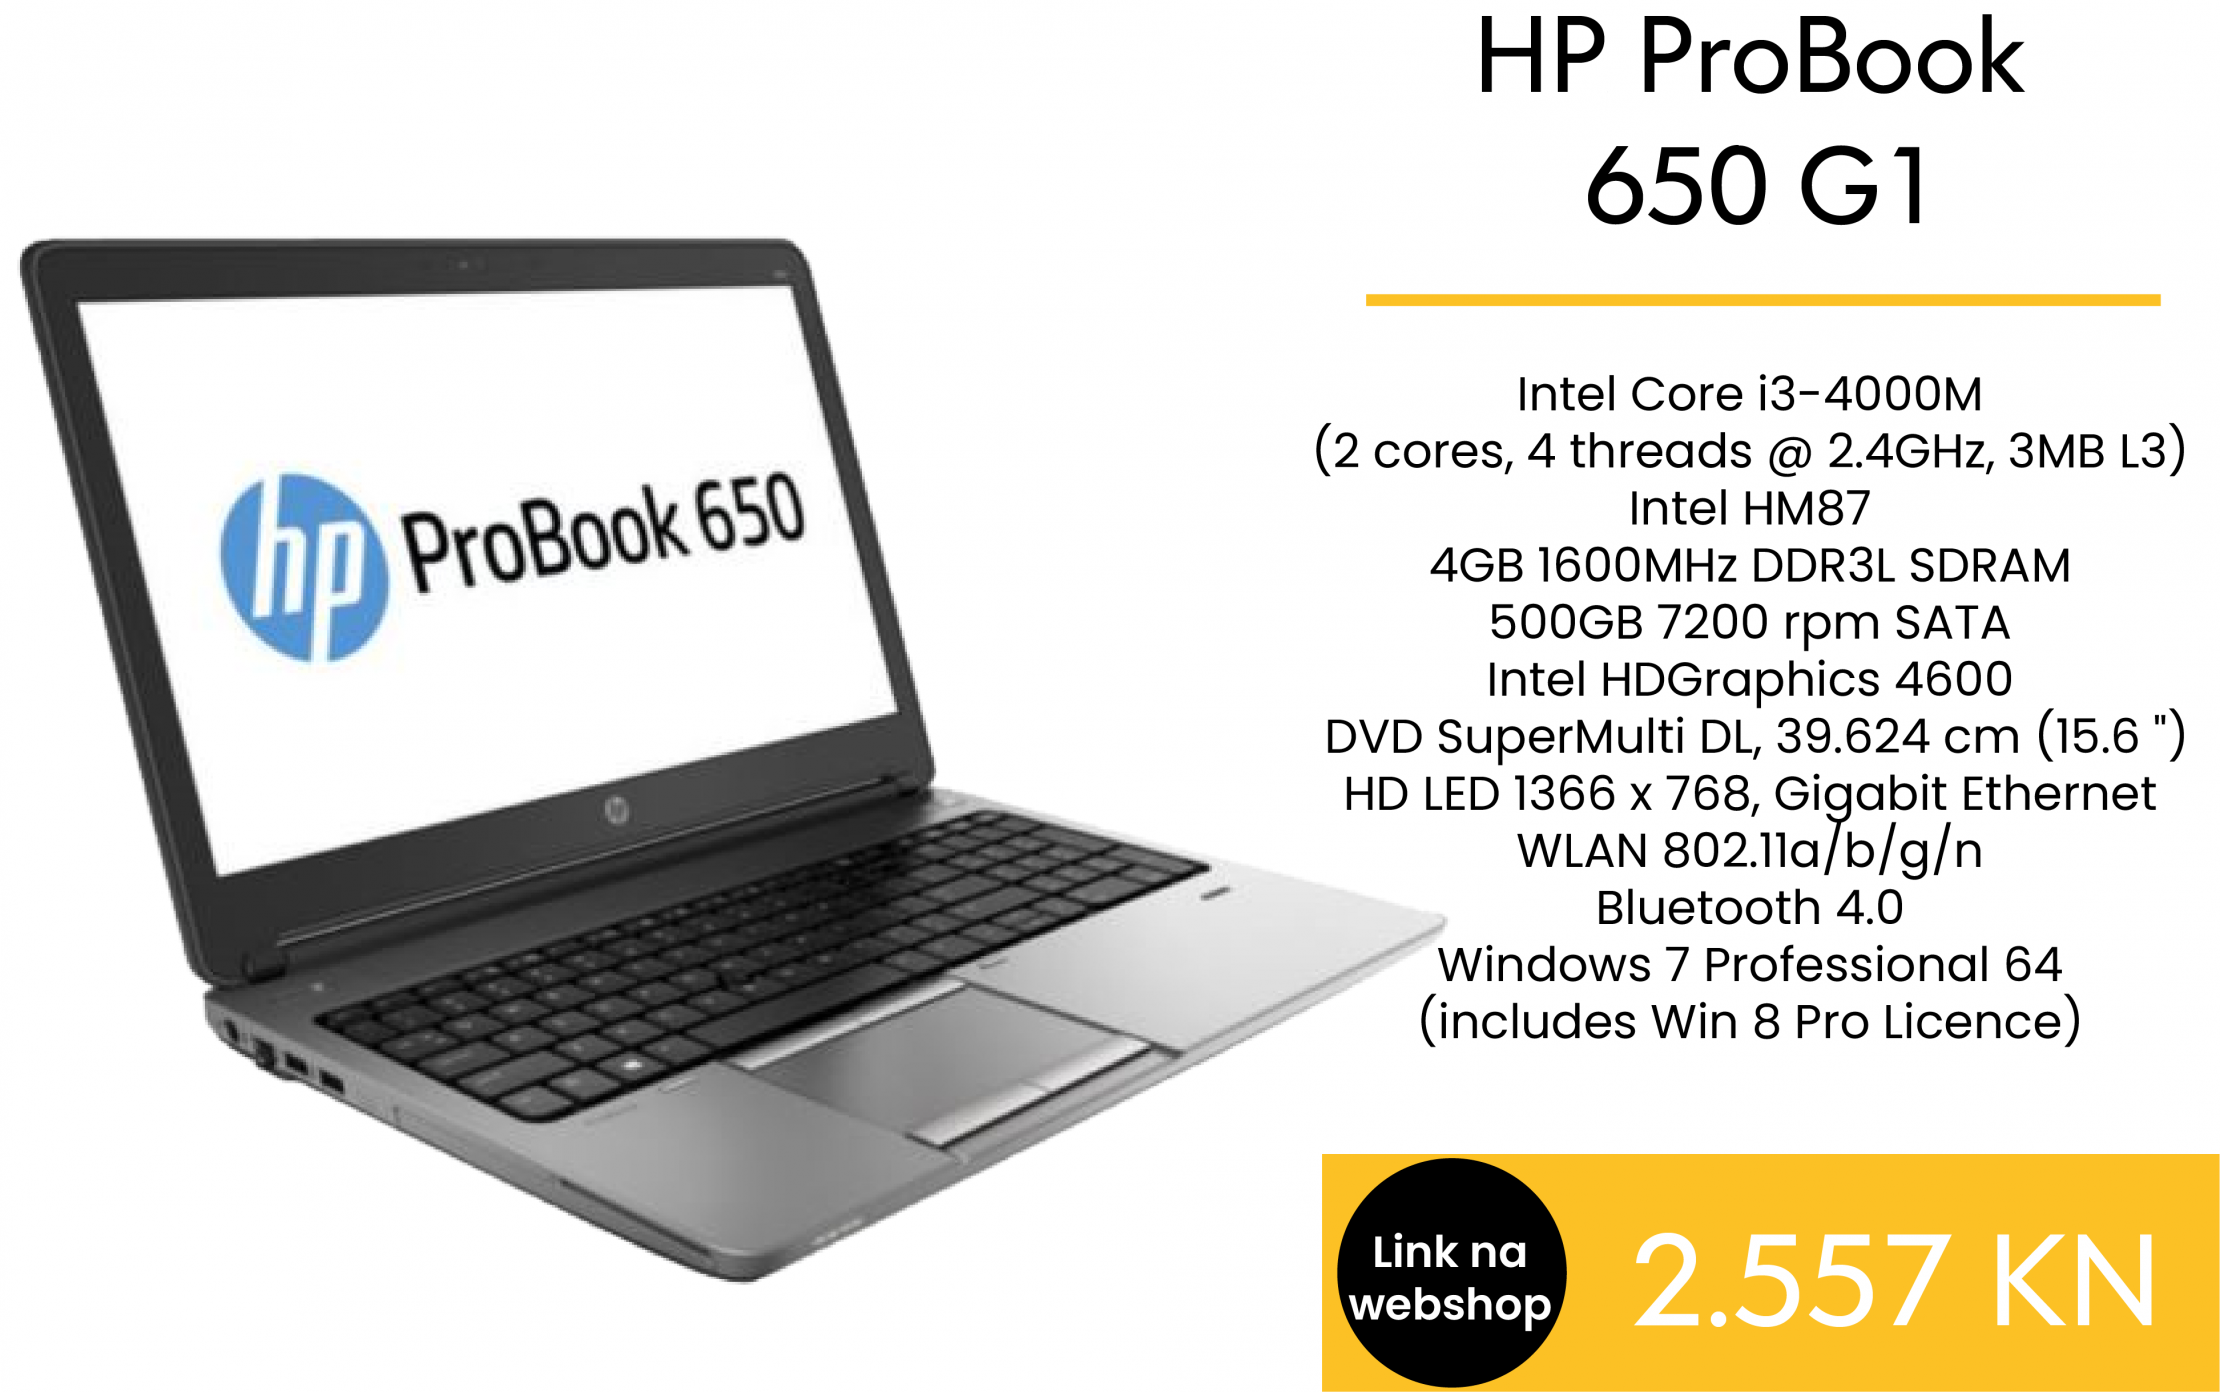 HPP-H5G74ET-ABU